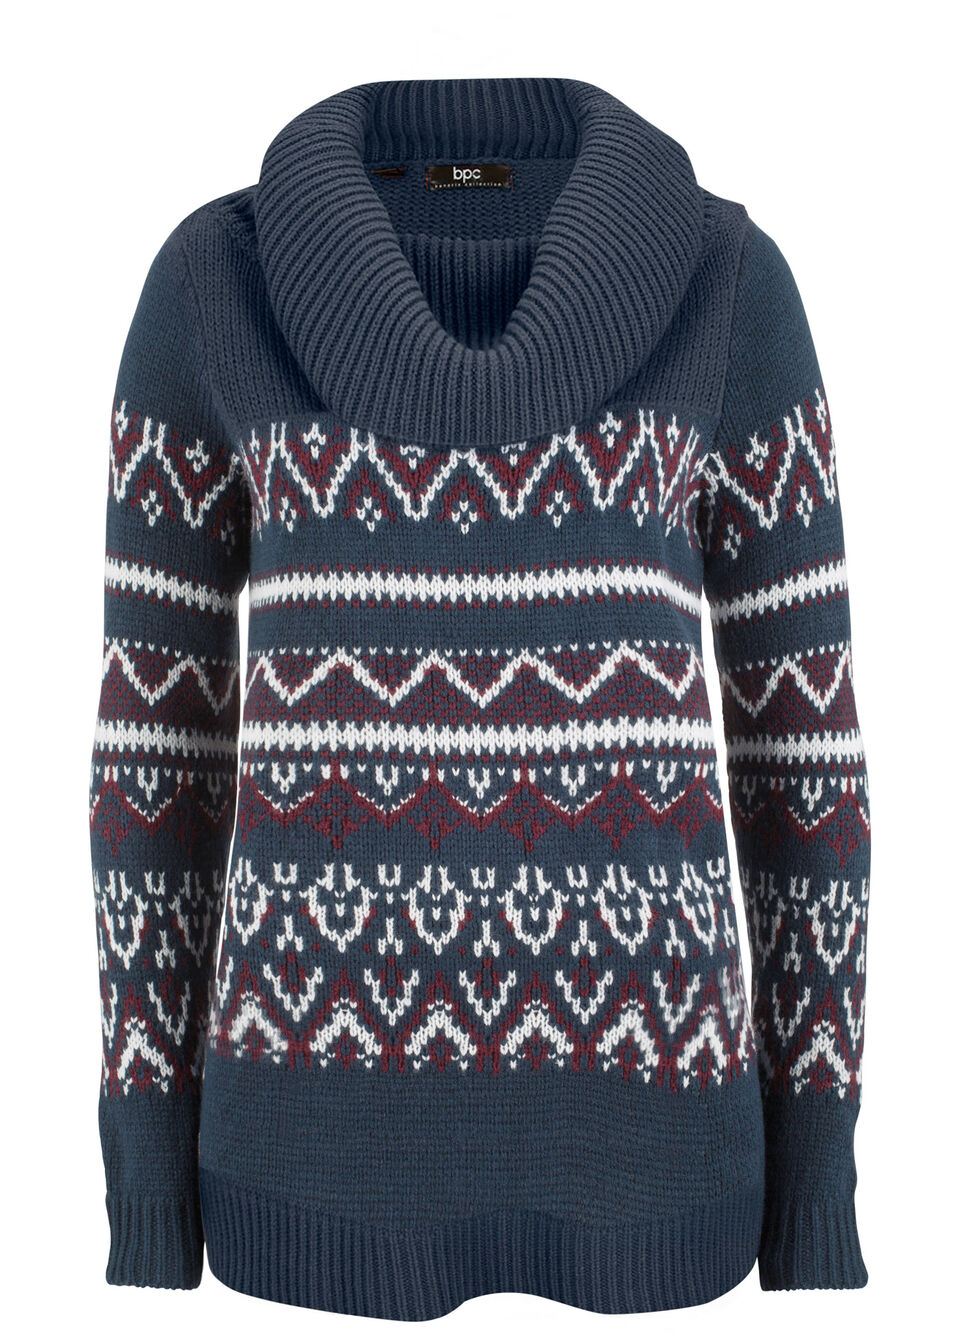 Купить Свитера, Пуловер с норвежским узором, bonprix, темно-синий с узором